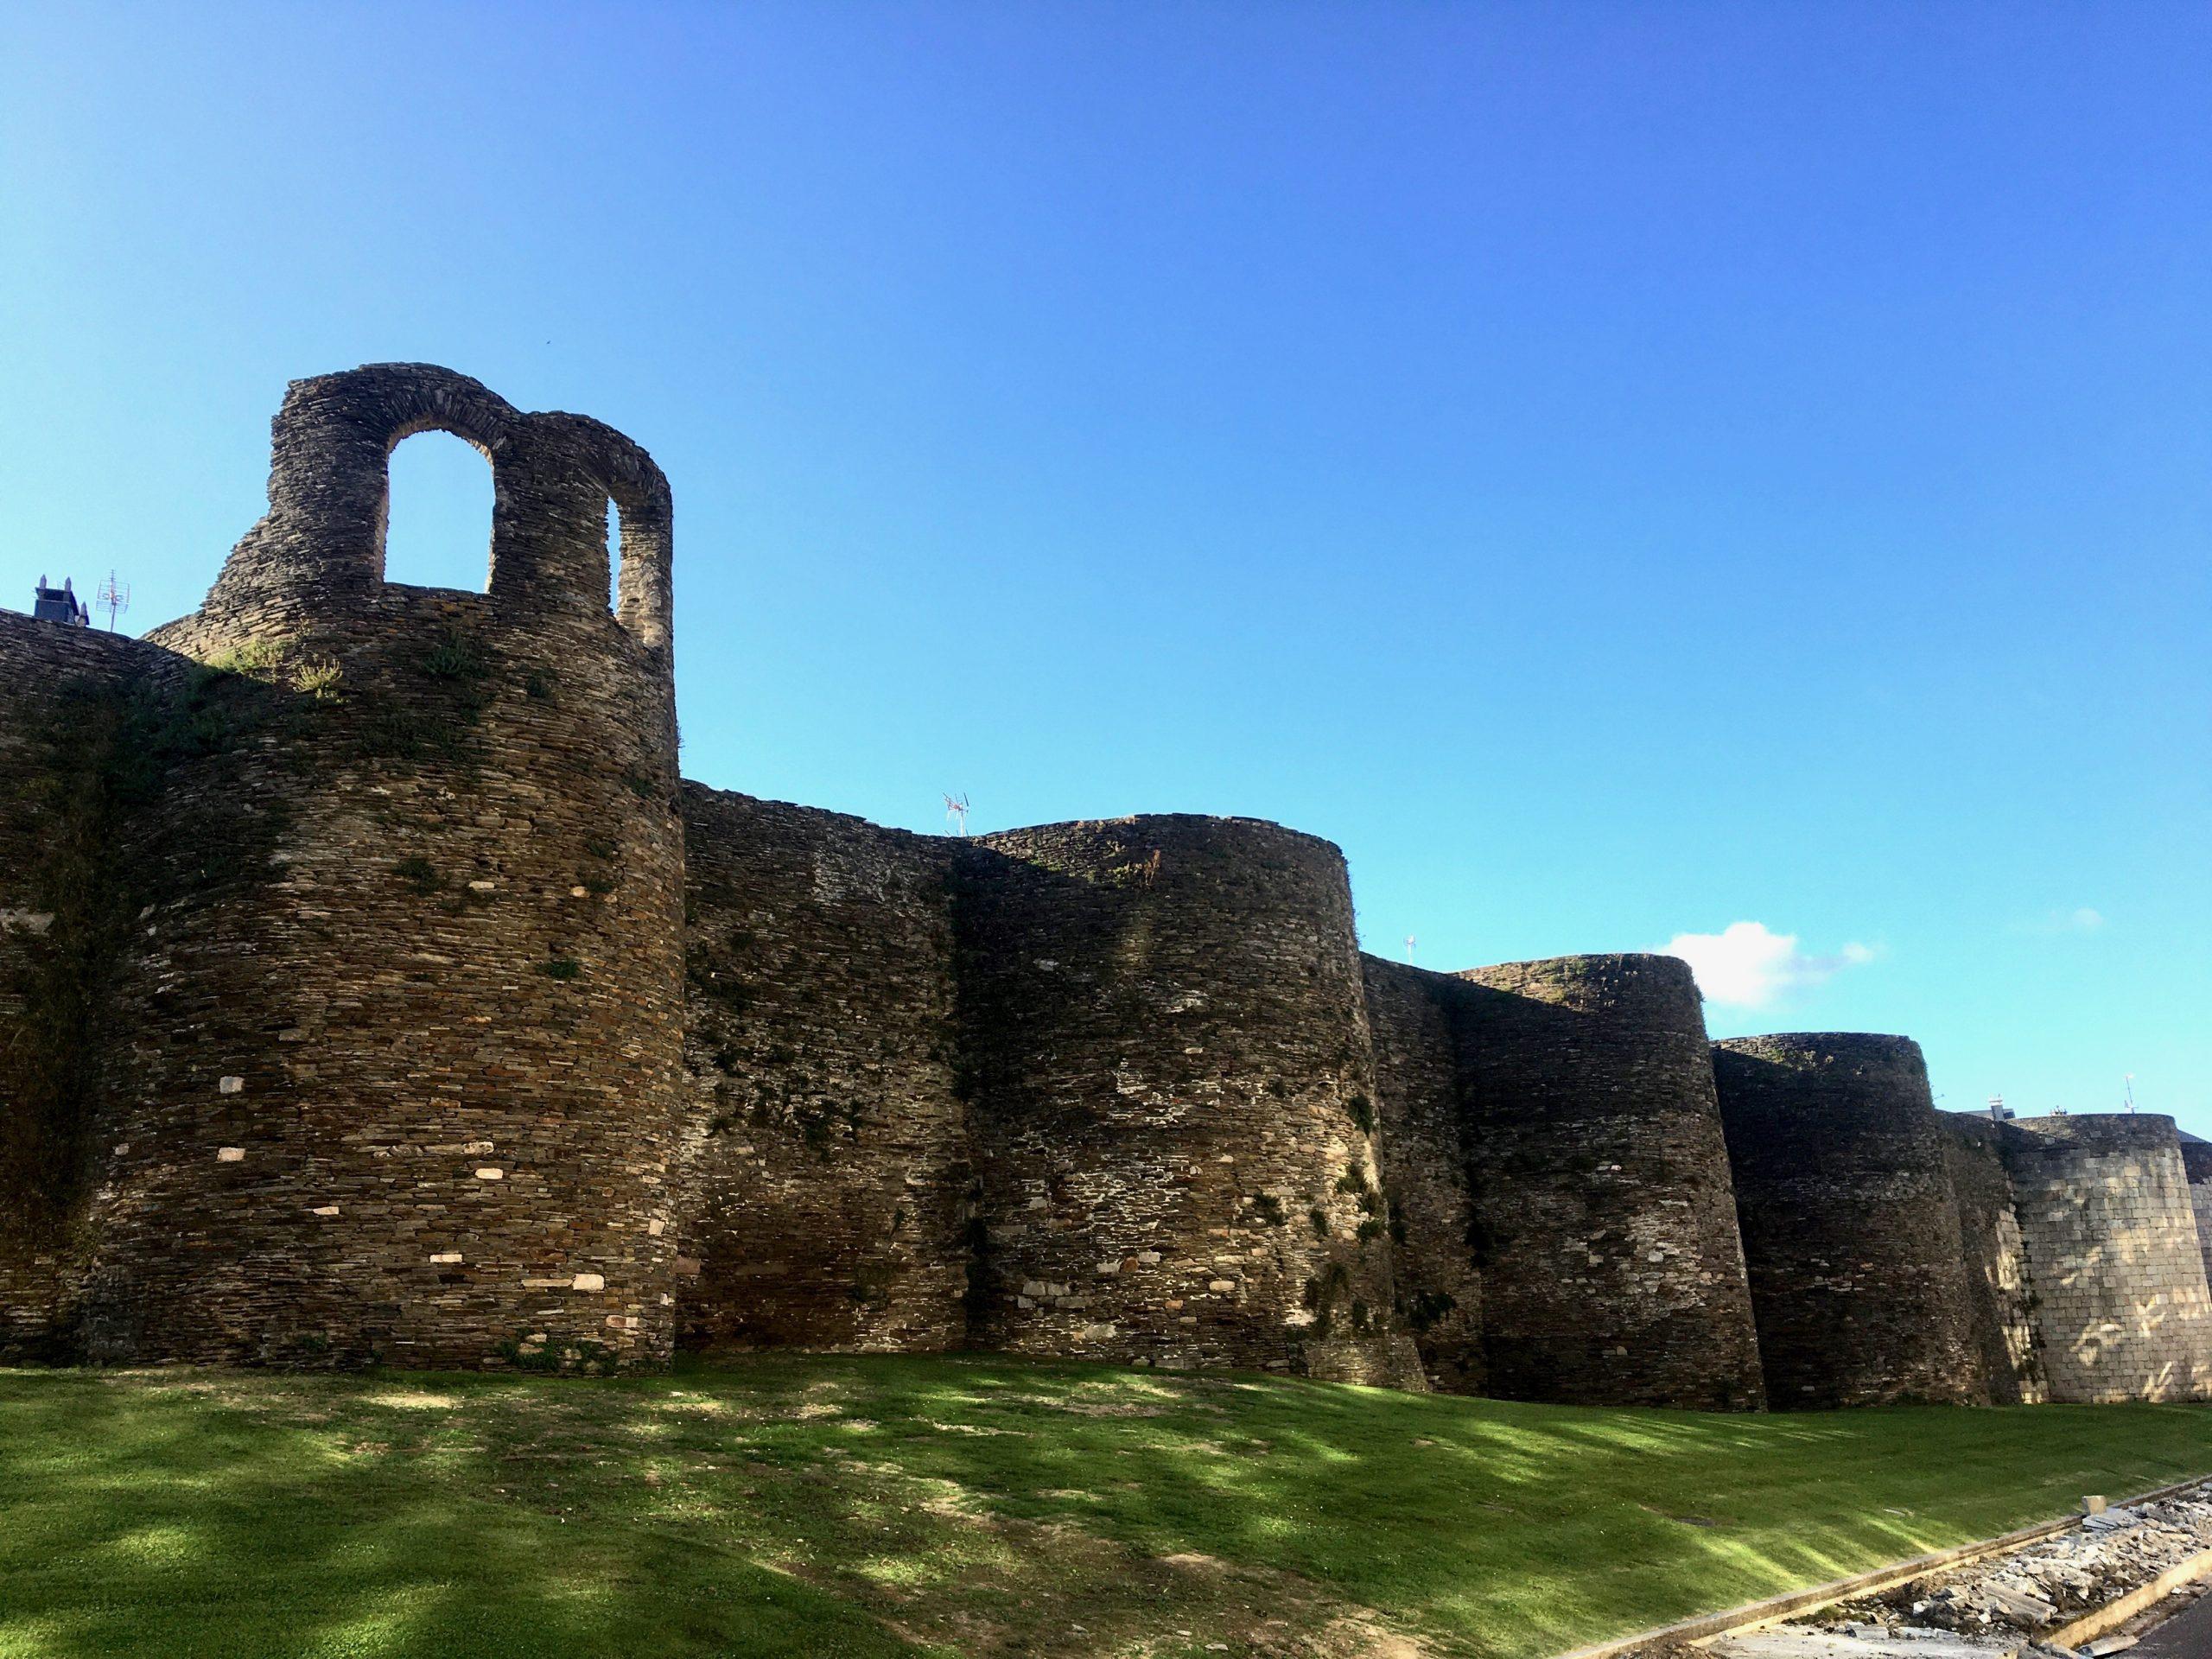 View of Roman city walls, Lugo, Spain, Camino Primitivo